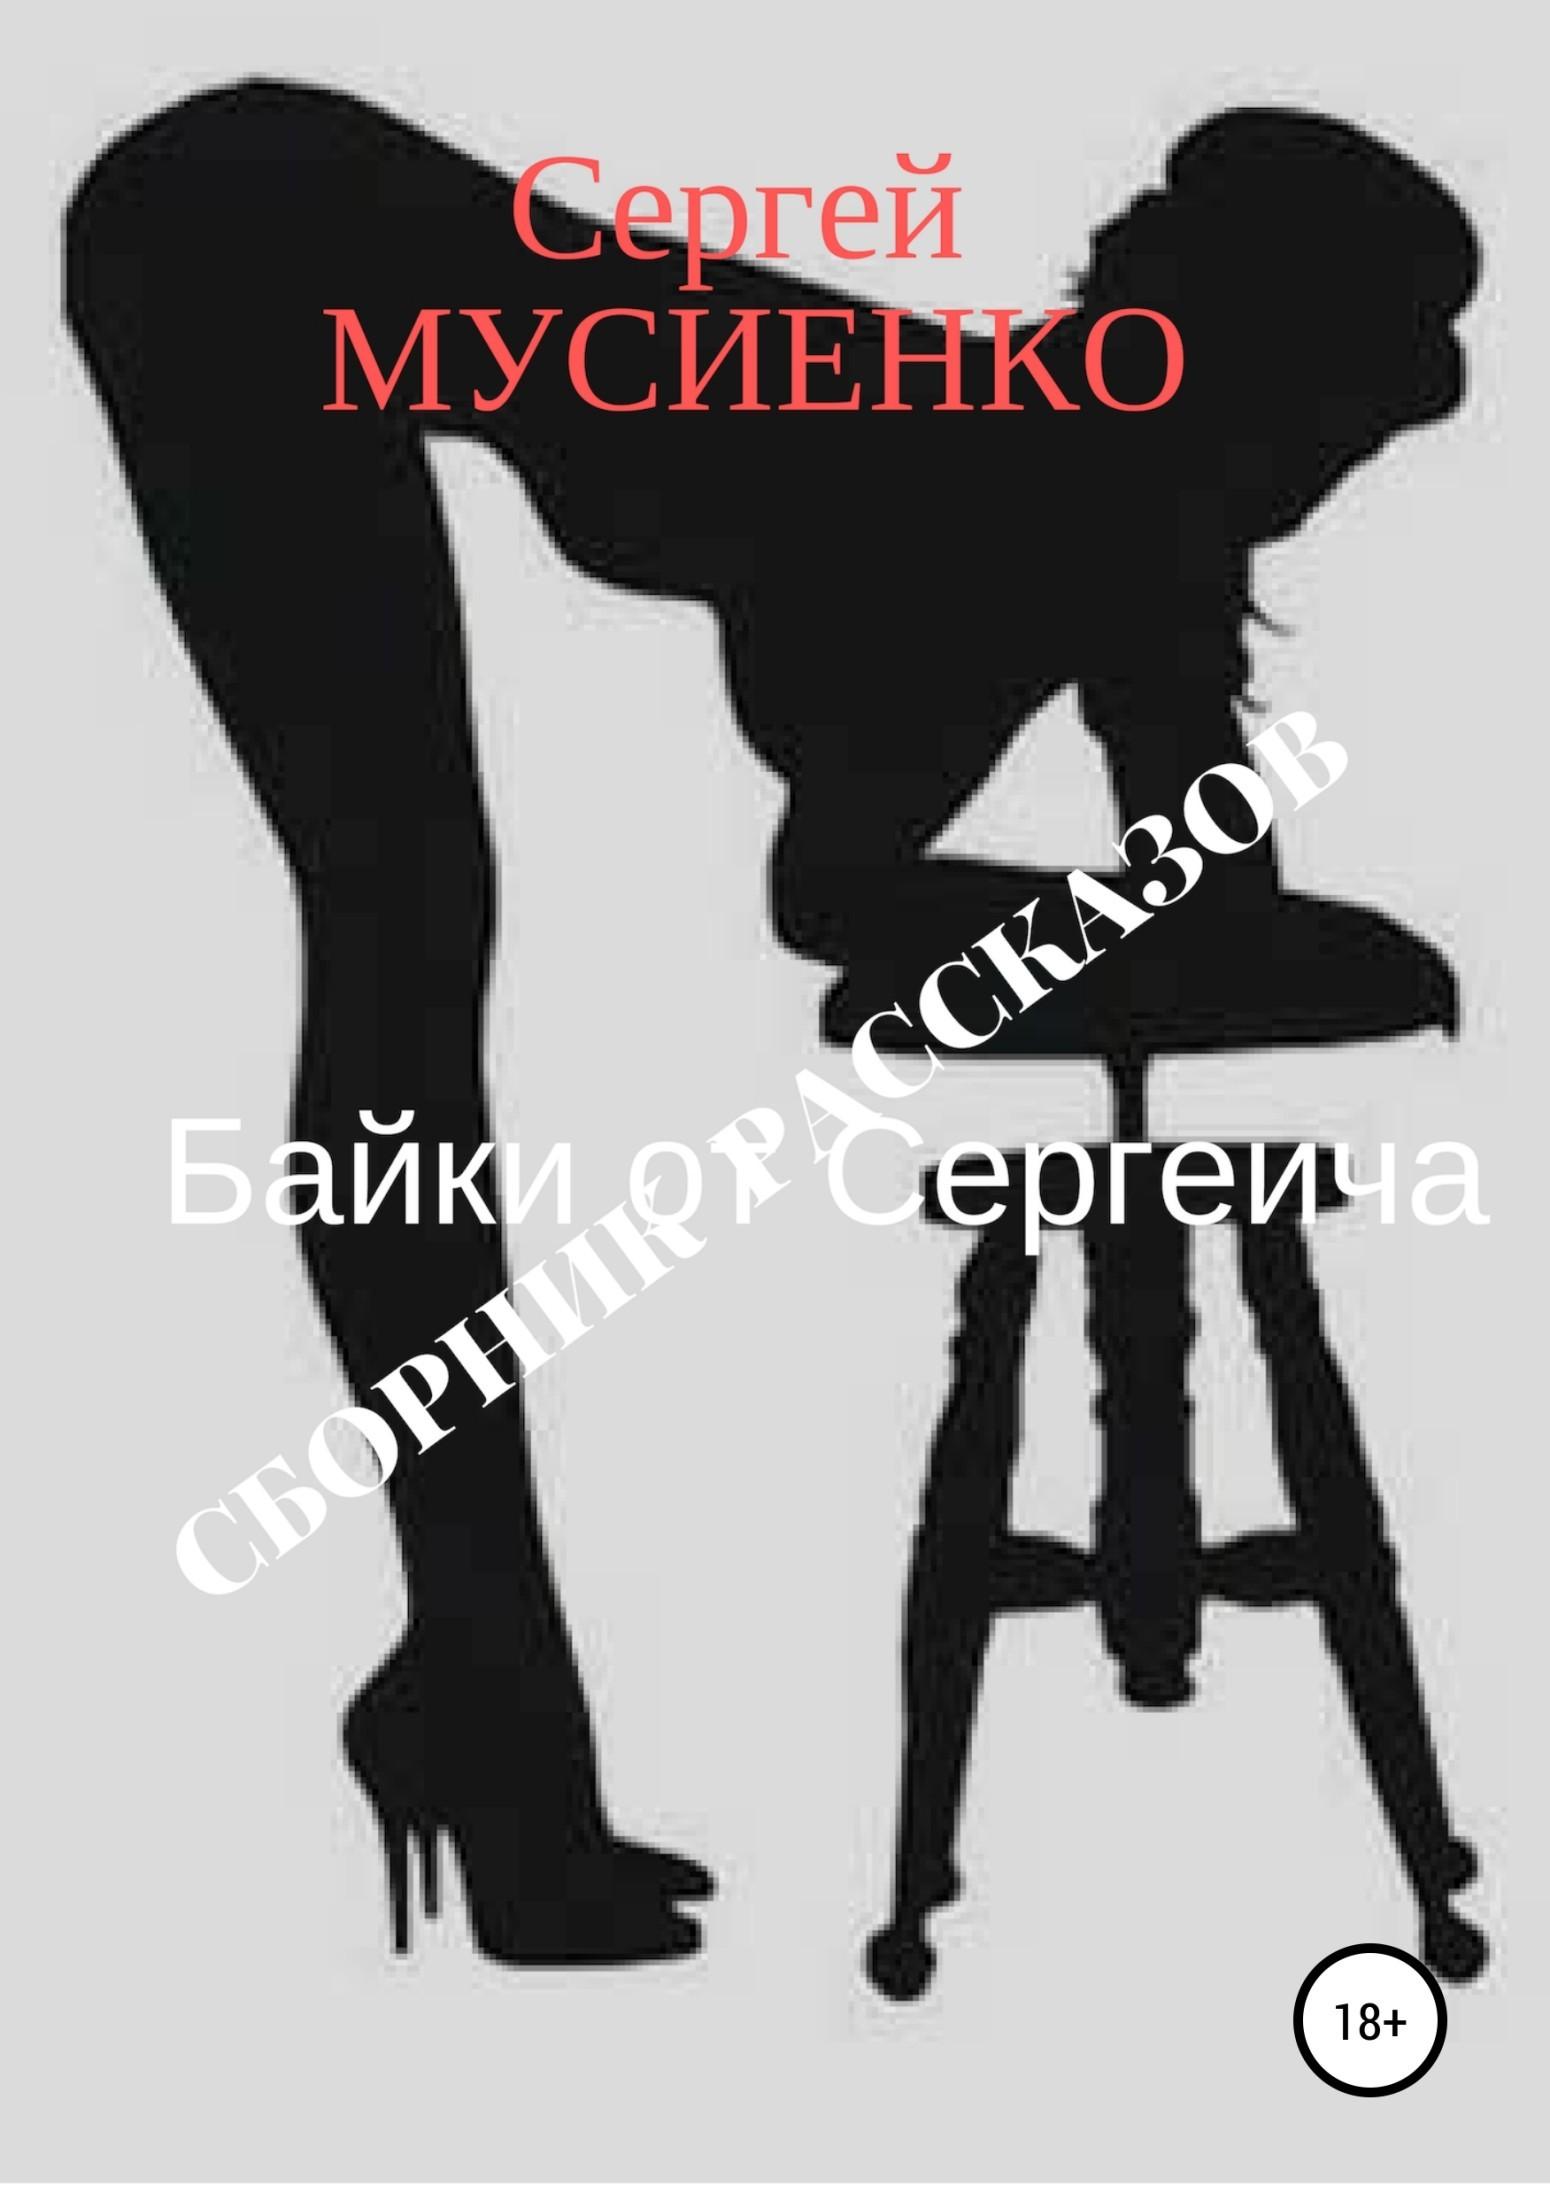 Сергей Мусиенко Байки от Сергеича. Сборник рассказов цена и фото